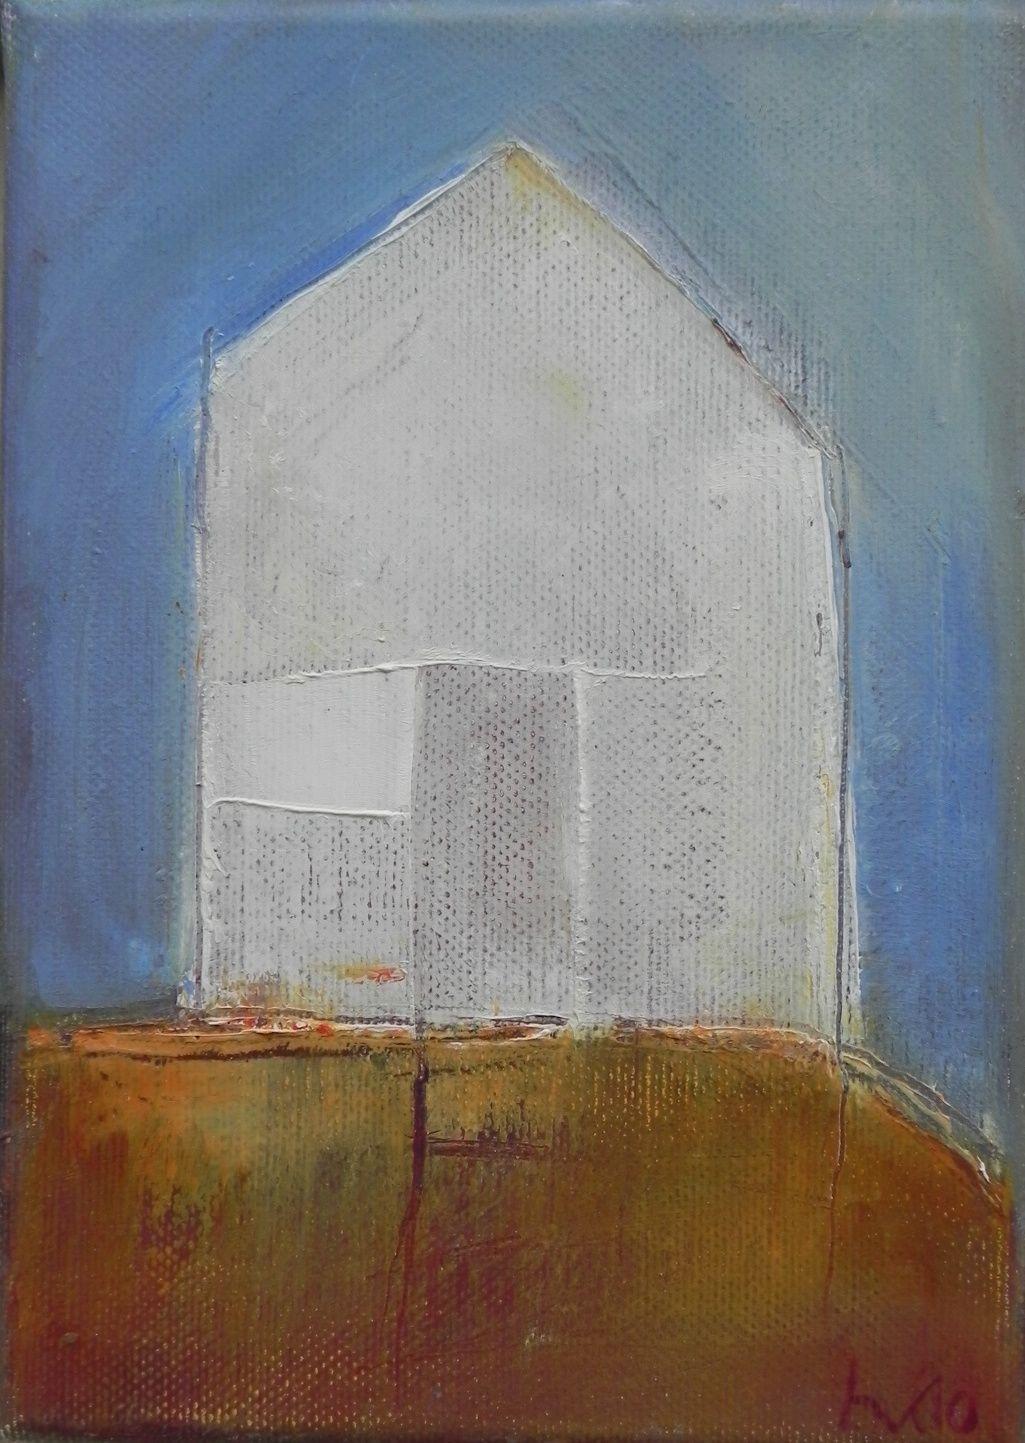 house on top/ Bea van Twillert